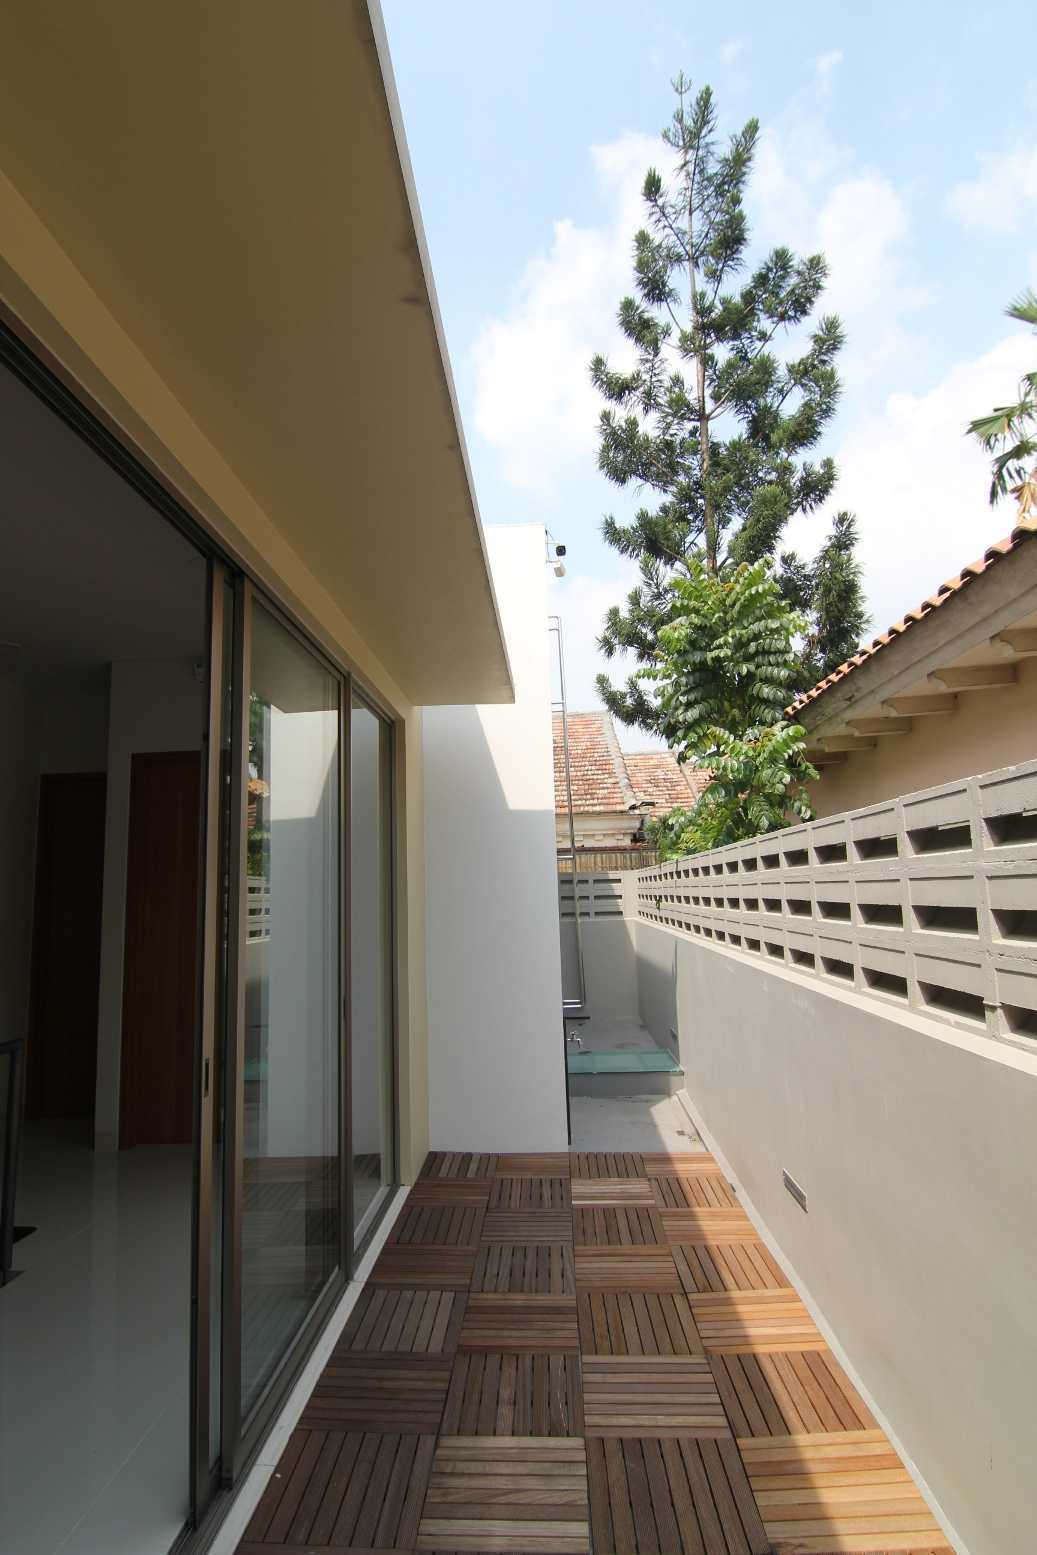 Sony Budiono & Partner Architect Firm O Residence Bencongan, Klp. Dua, Tangerang, Banten 15810, Indonesia Bencongan, Klp. Dua, Tangerang, Banten 15810, Indonesia Corridor   42943